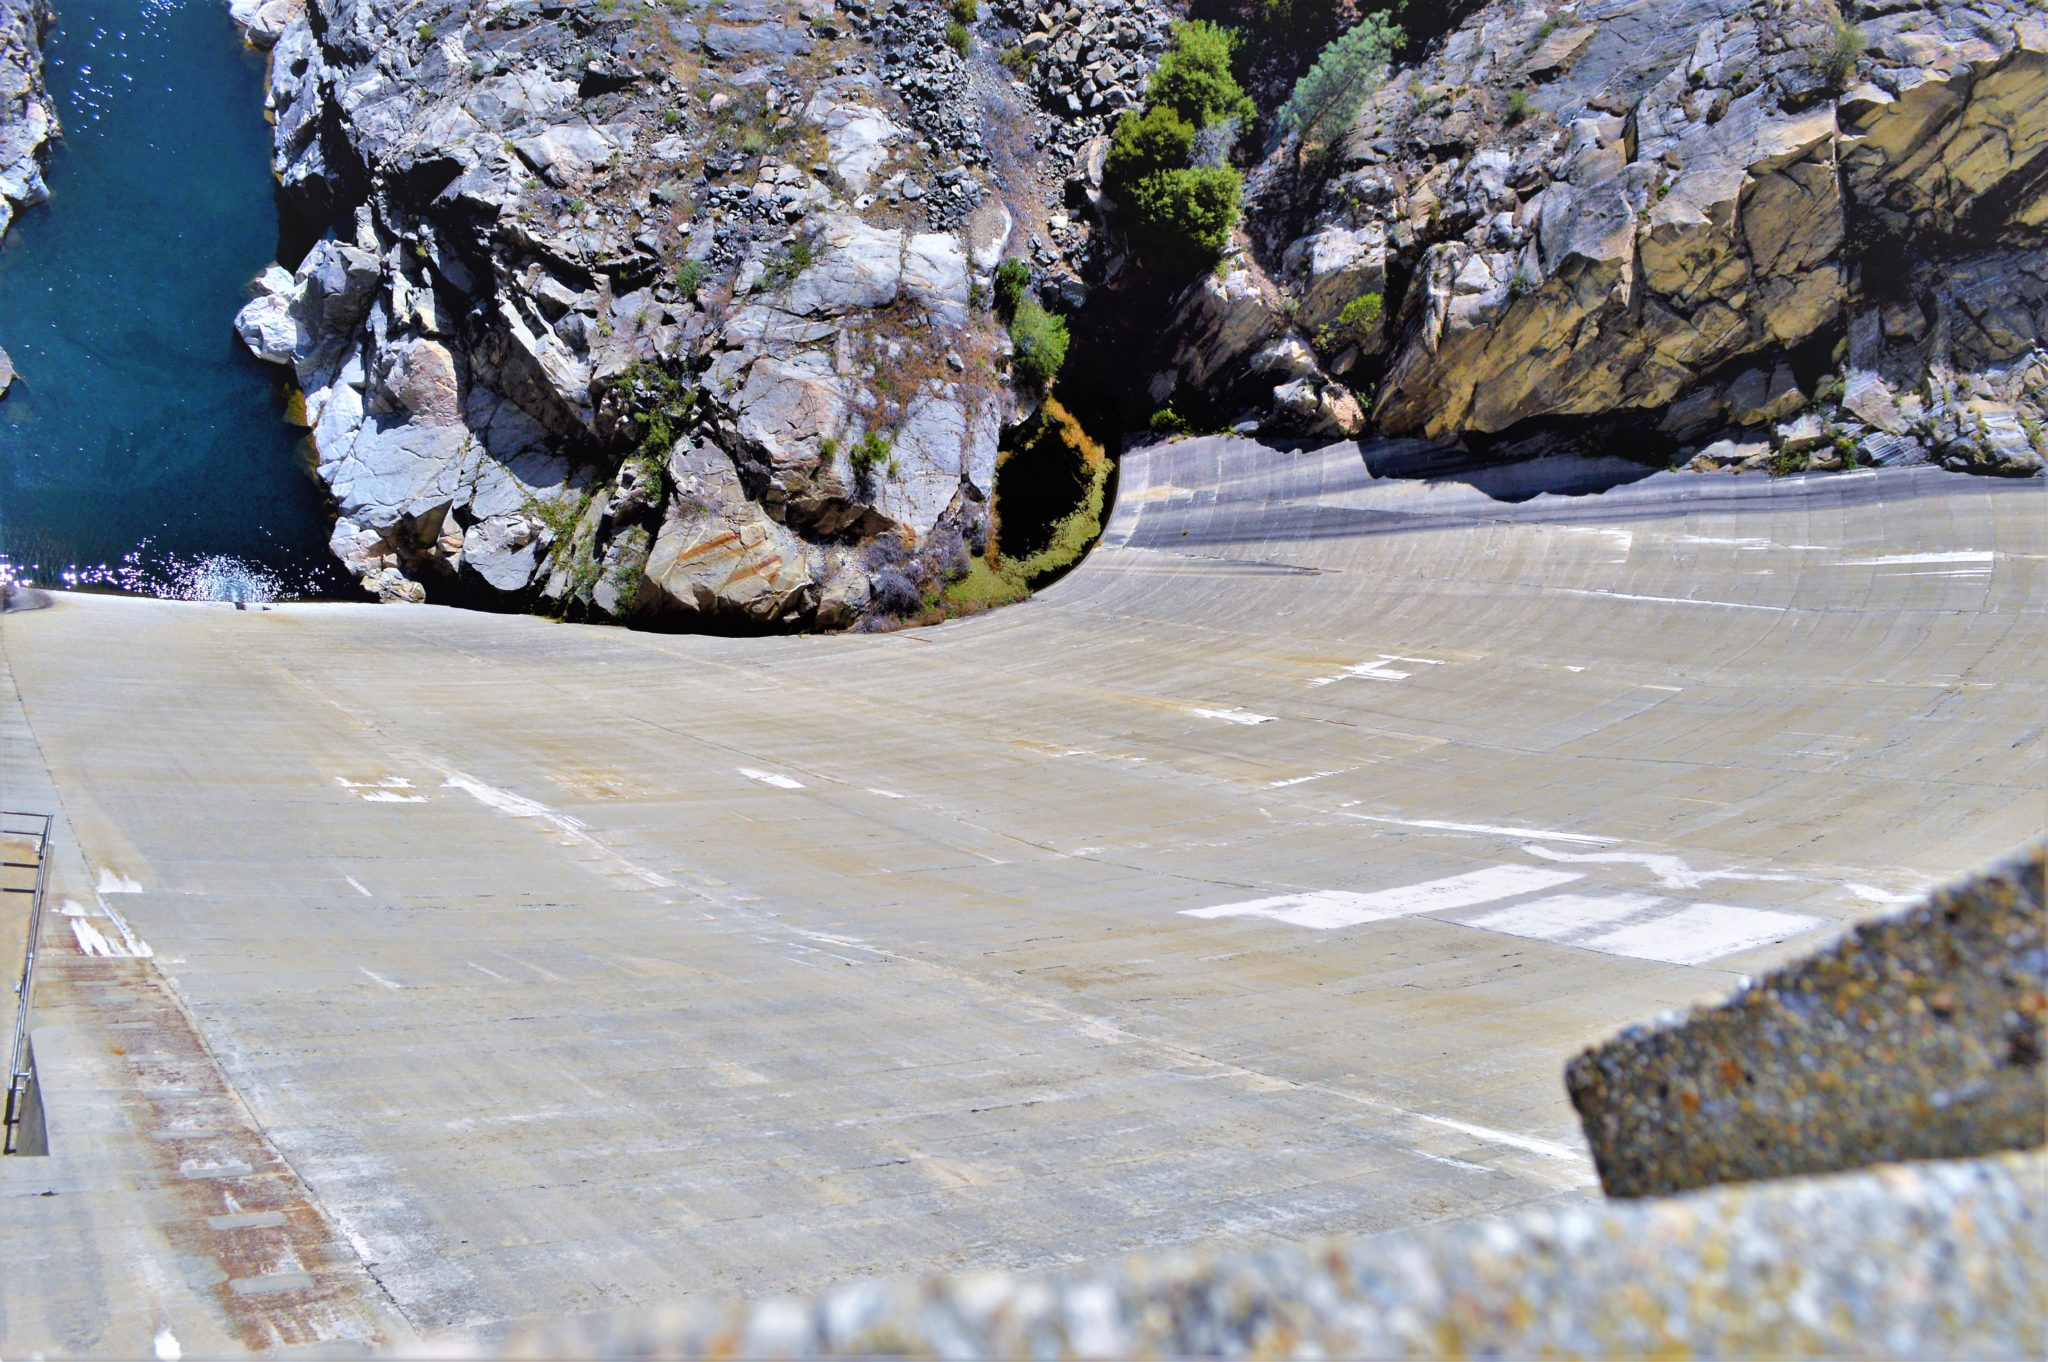 Looking down a dam, Hetch Hetchy, California